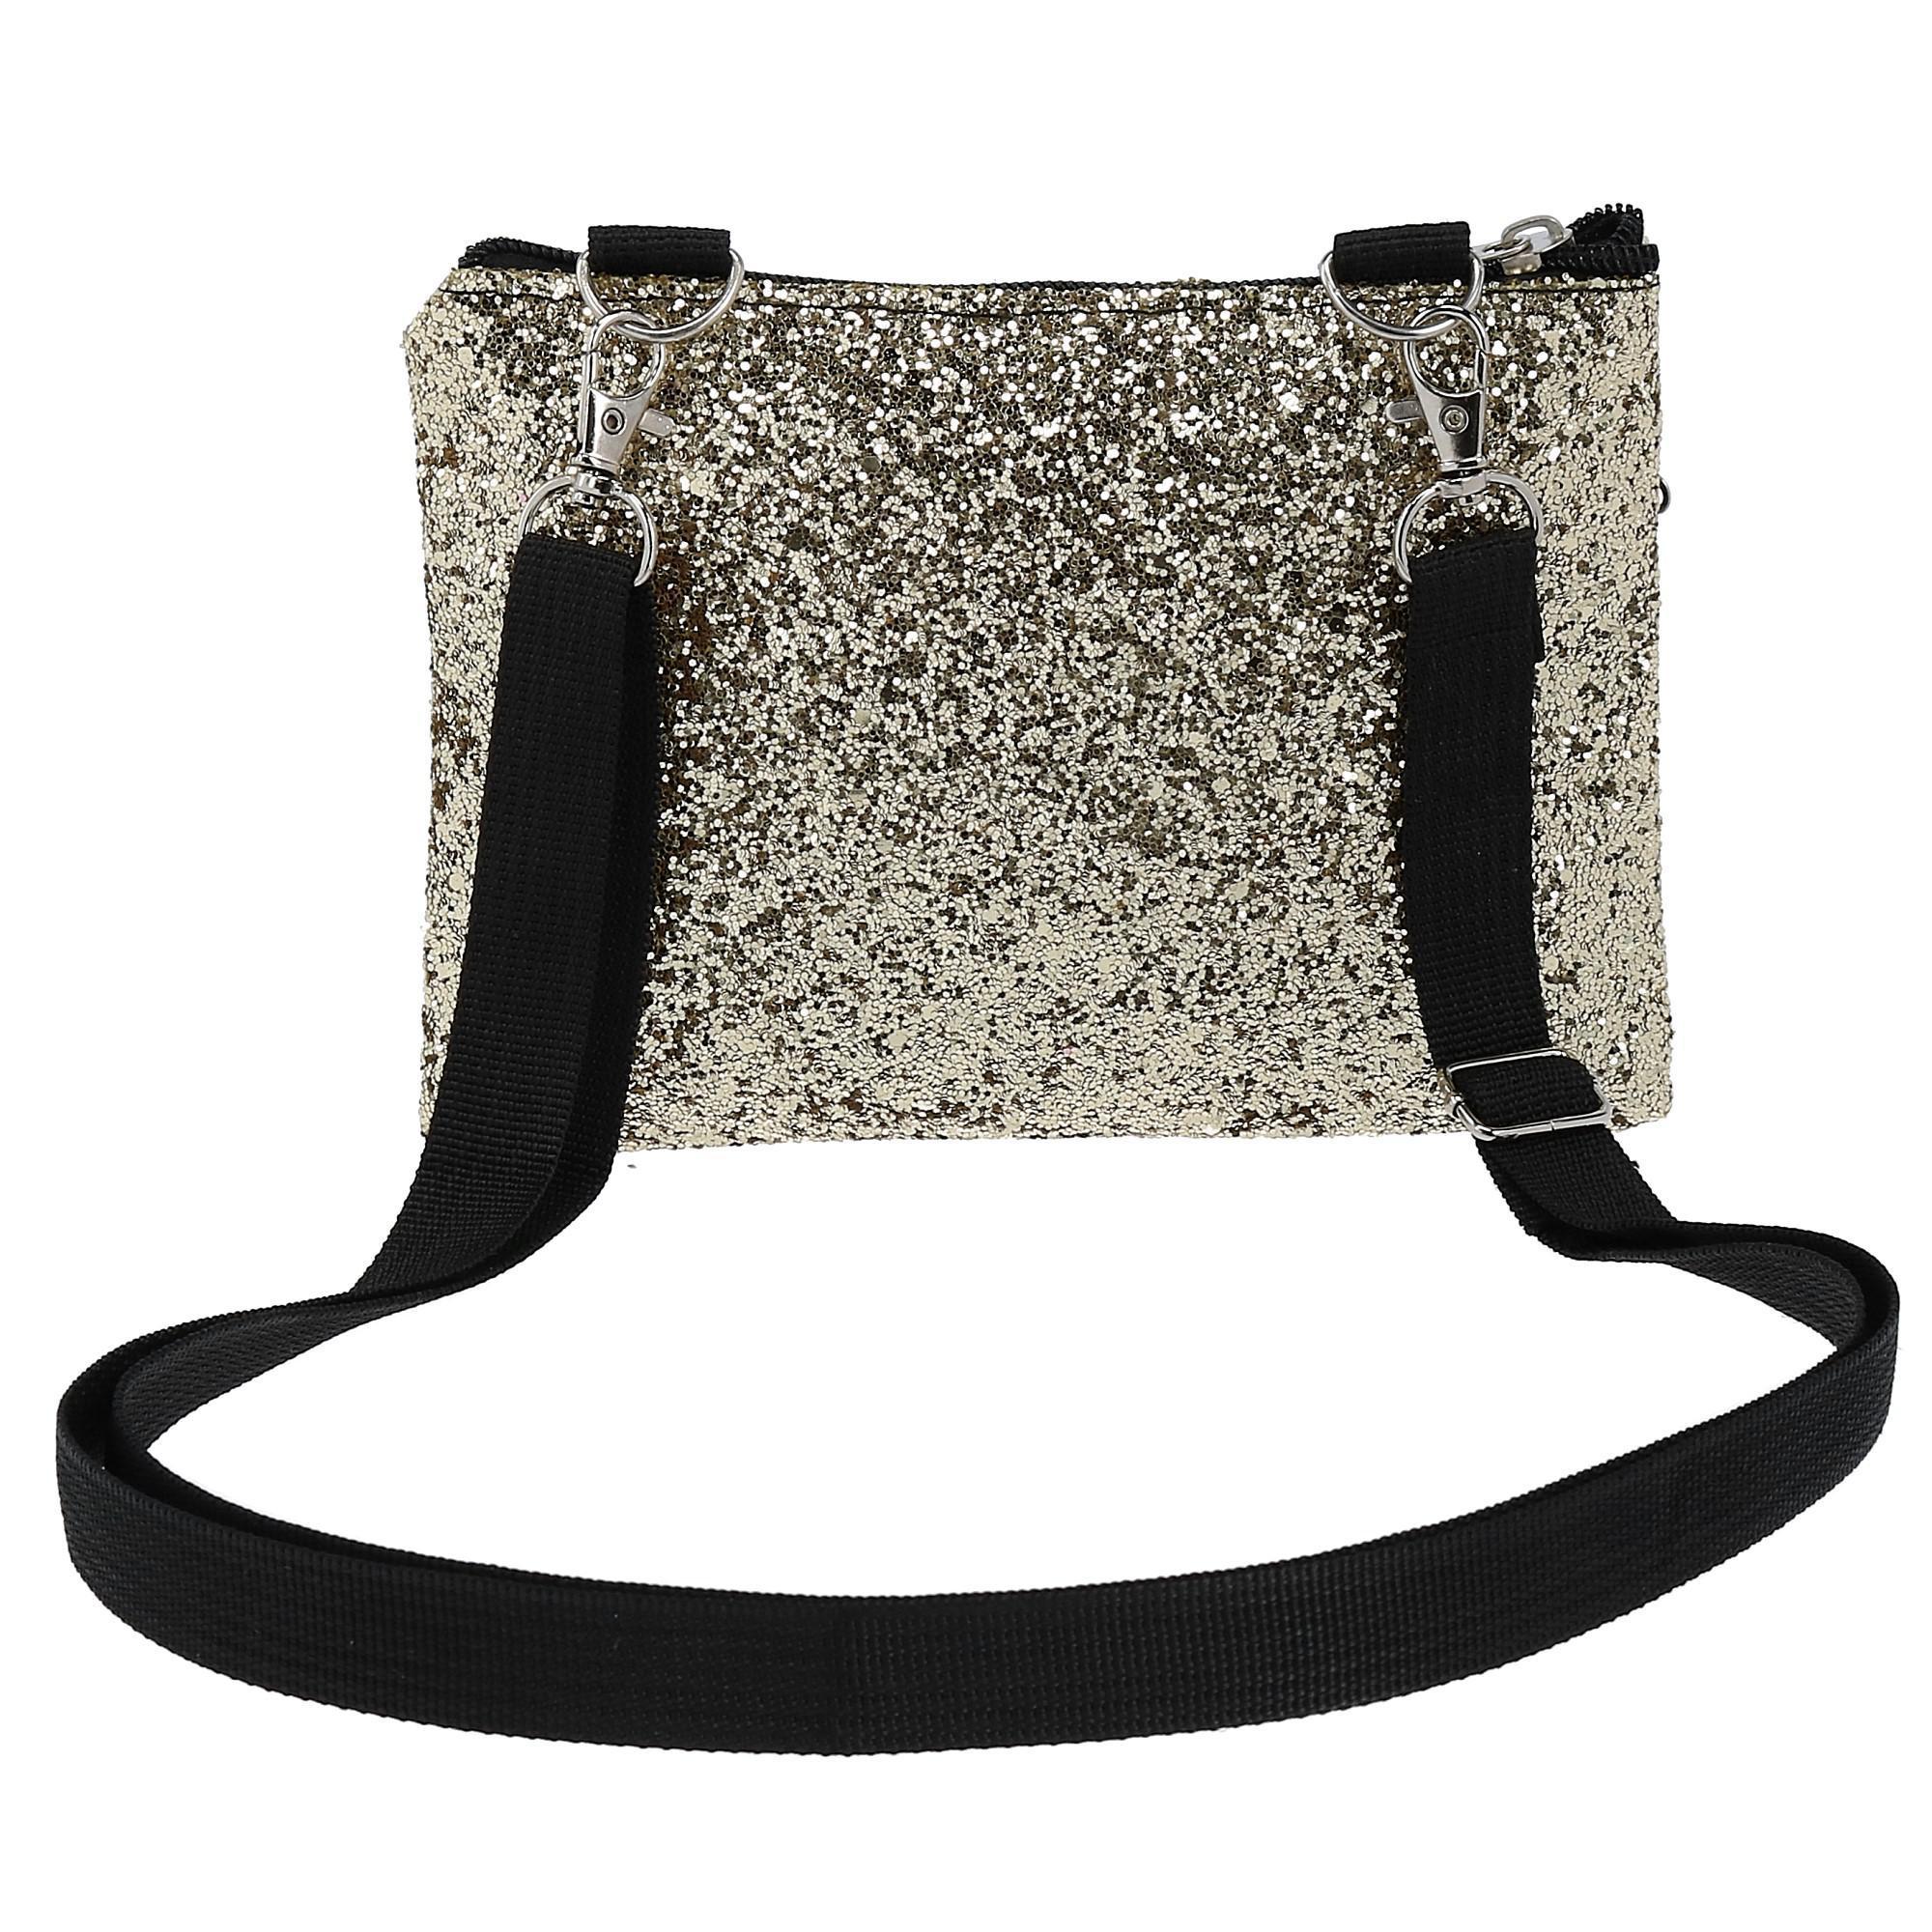 New-2-Moda-Fashion-Glitter-Waist-Pack-Convertible-Cross-Body-Bag thumbnail 10